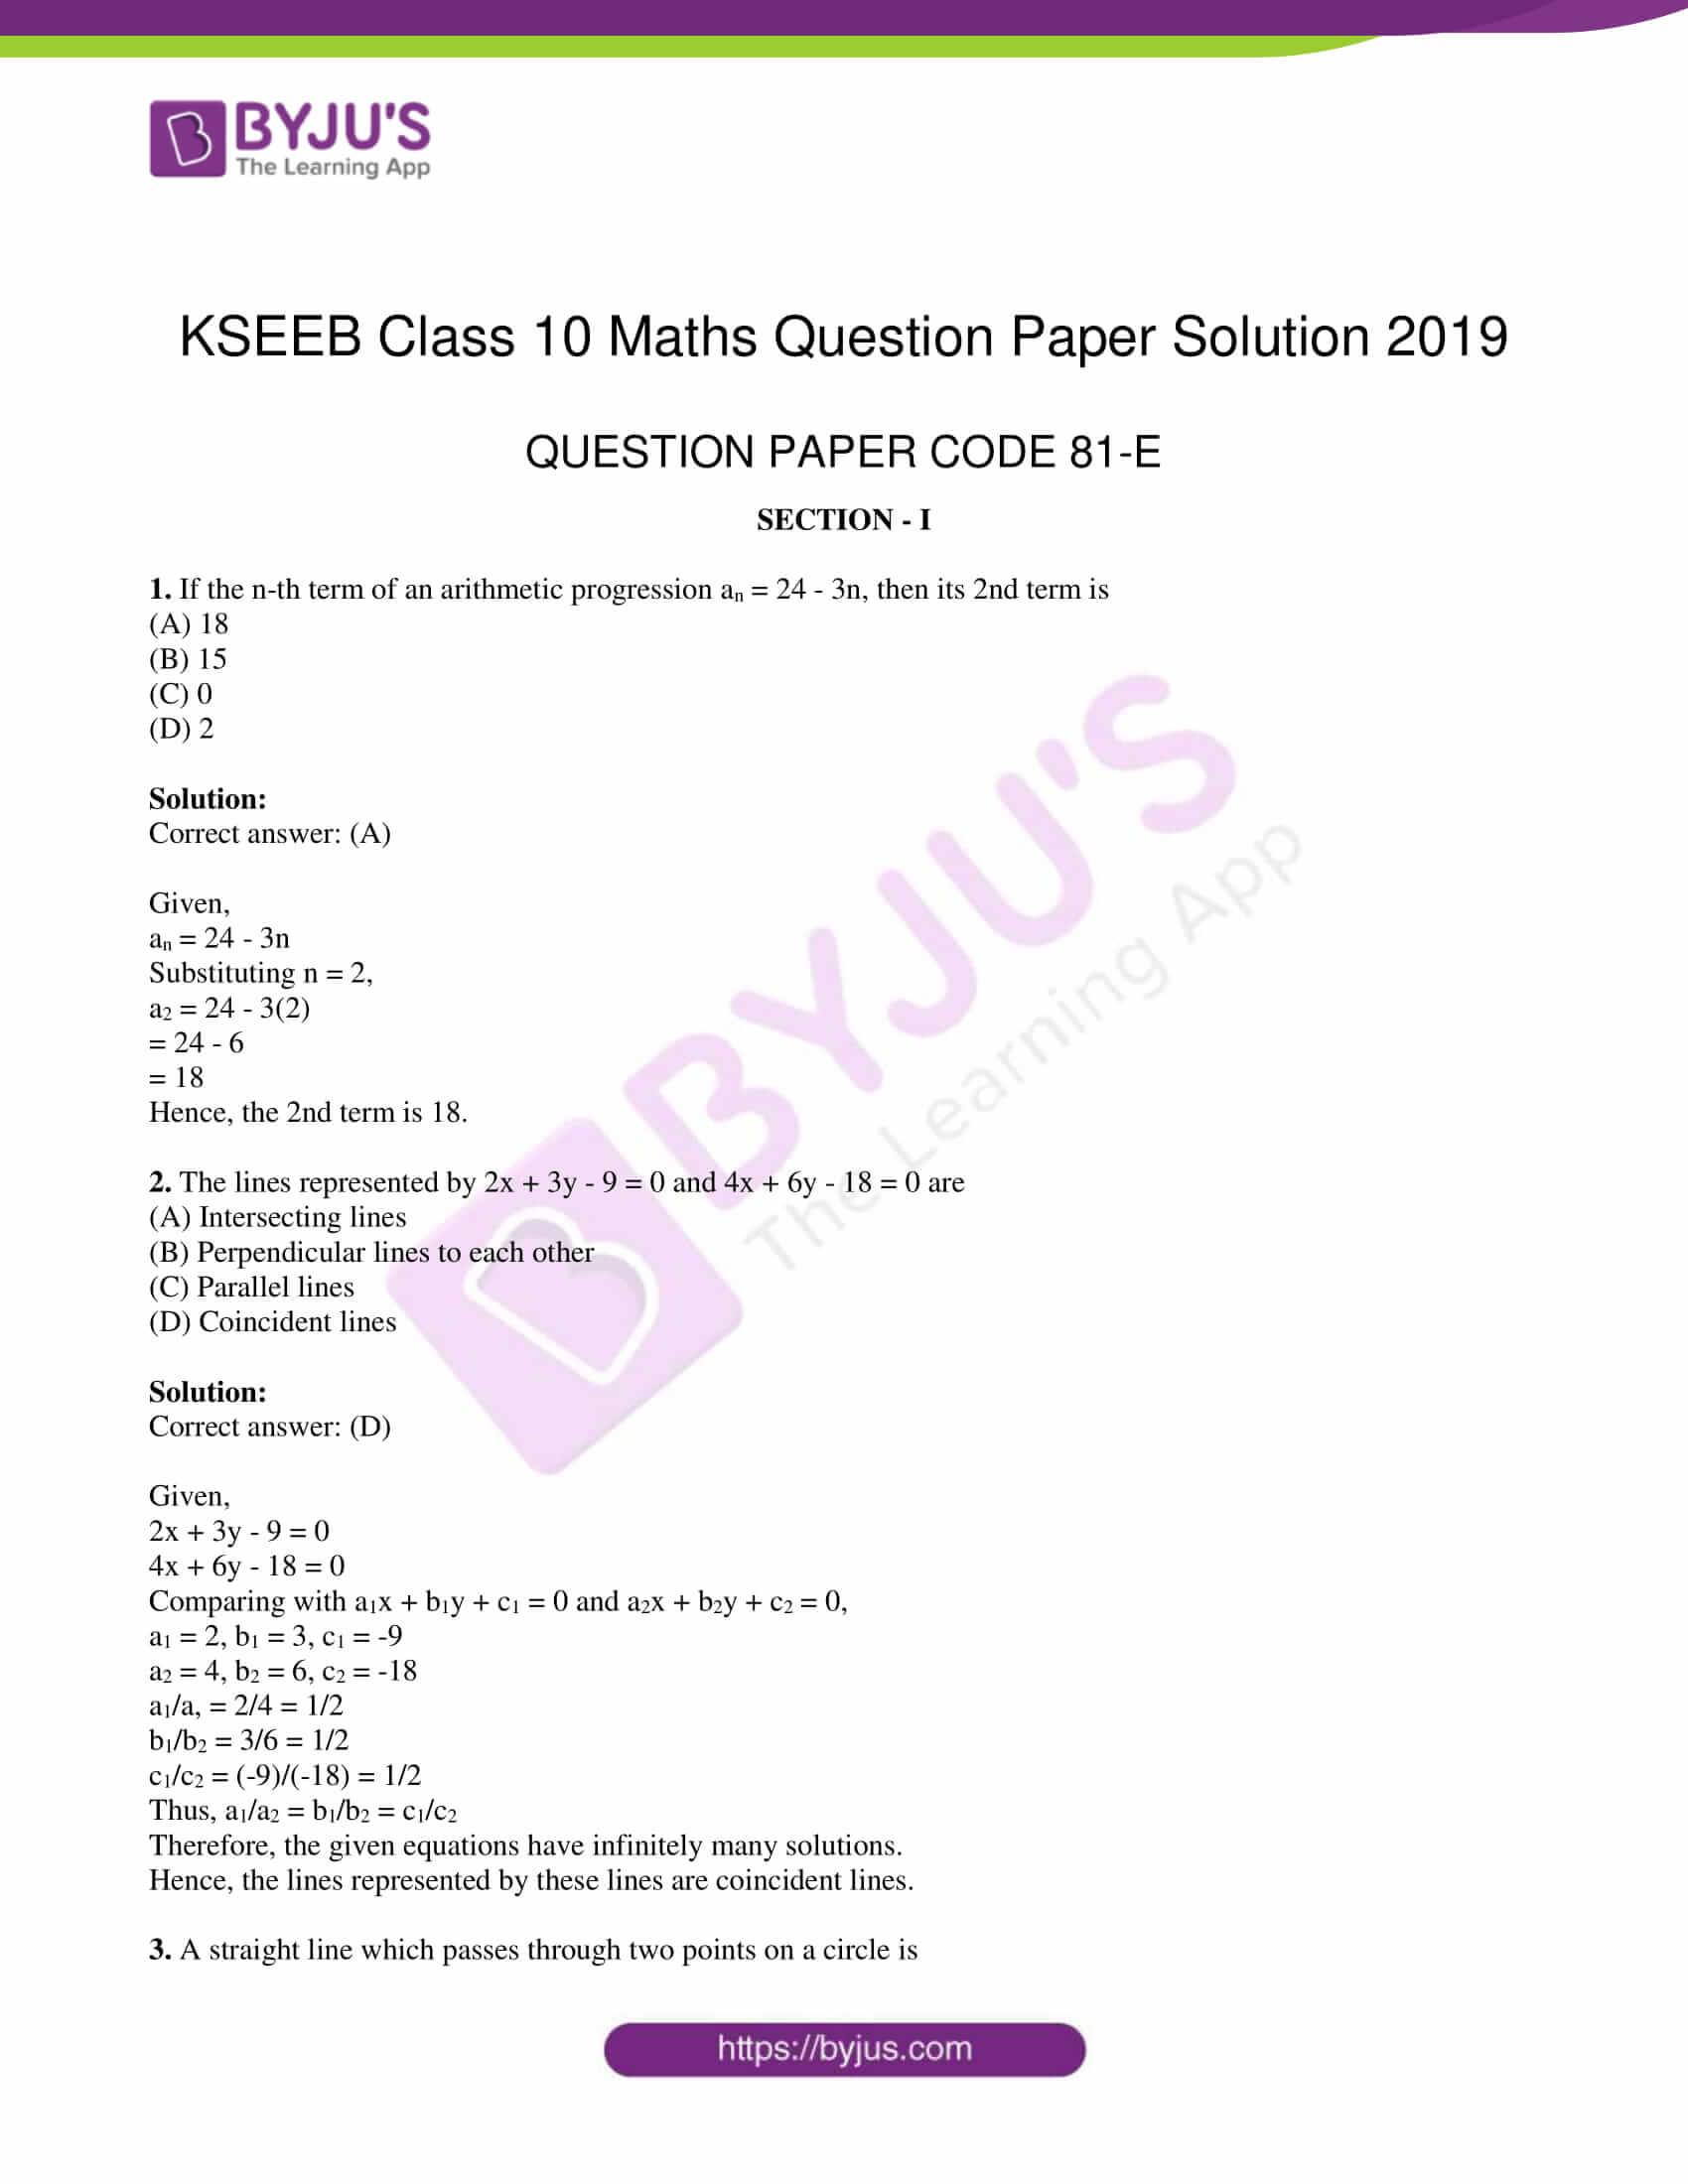 kseeb class 10 maths question paper solution 2019 01